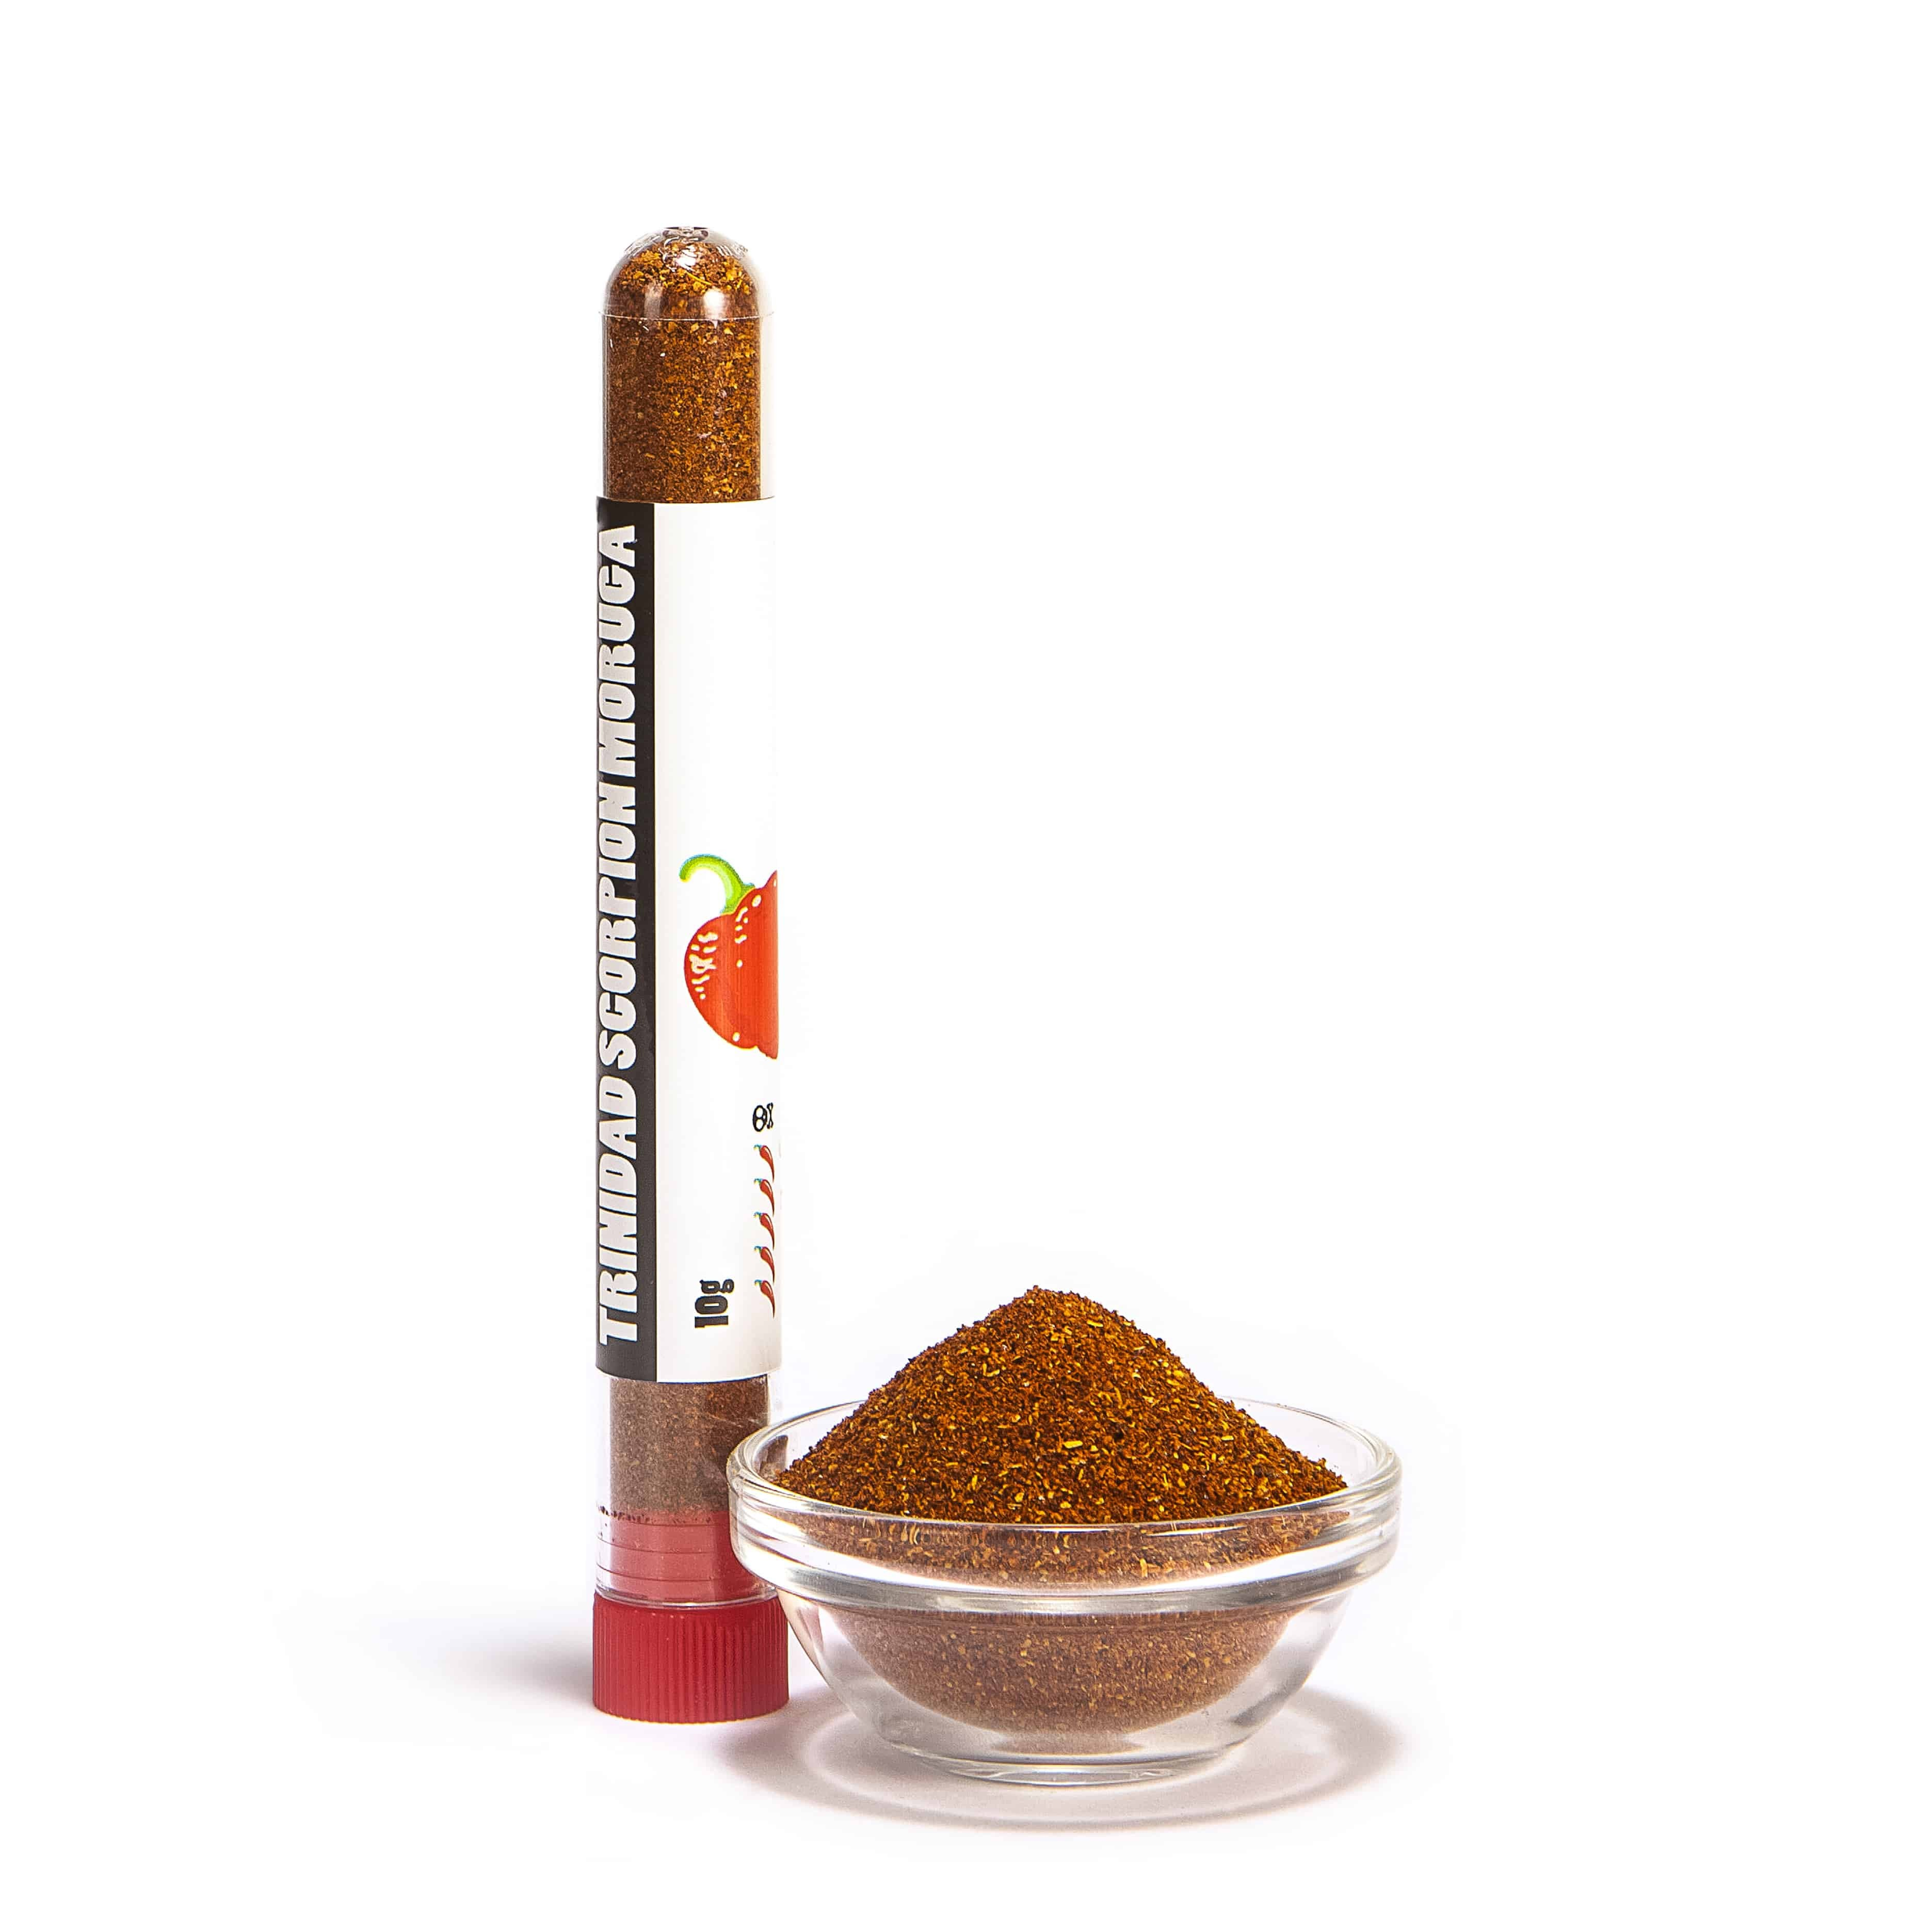 The chilli Doctor Trinidad Scorpion Moruga prášek 10 g